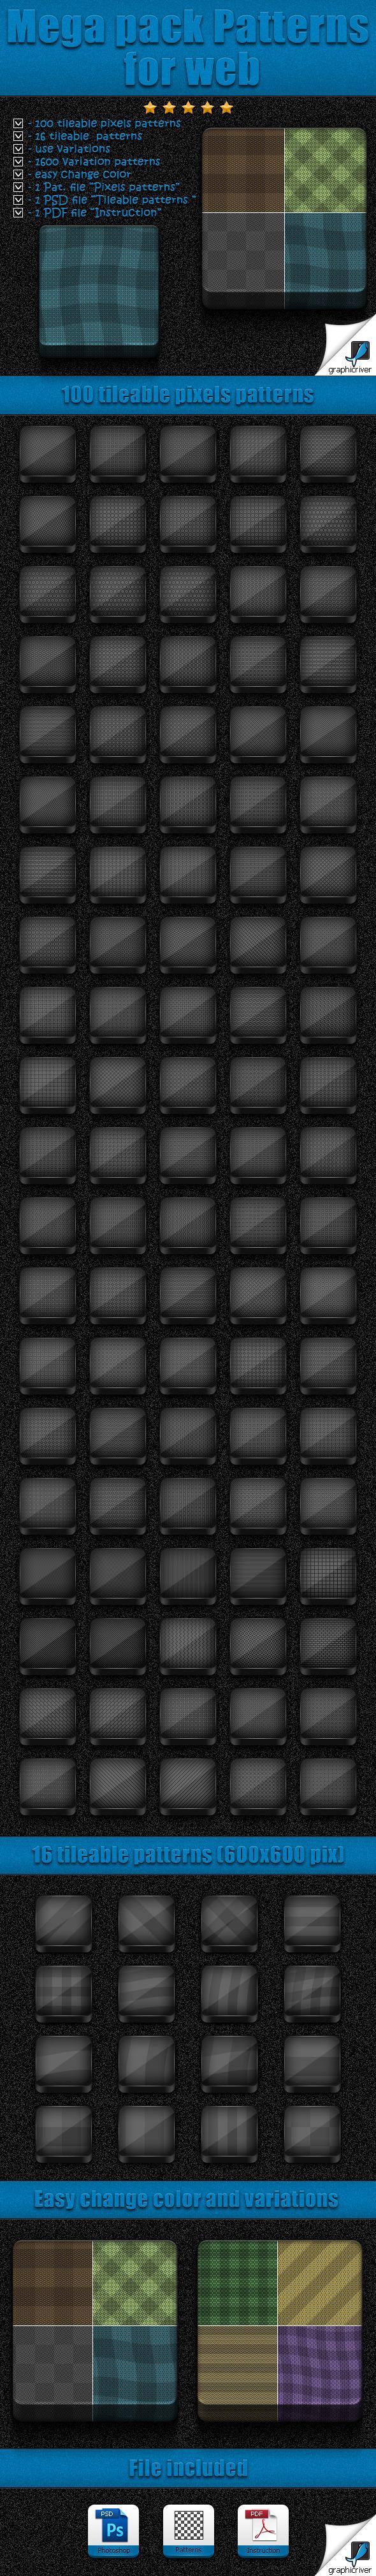 Mega Pack Patterns for Web - Textures / Fills / Patterns Photoshop